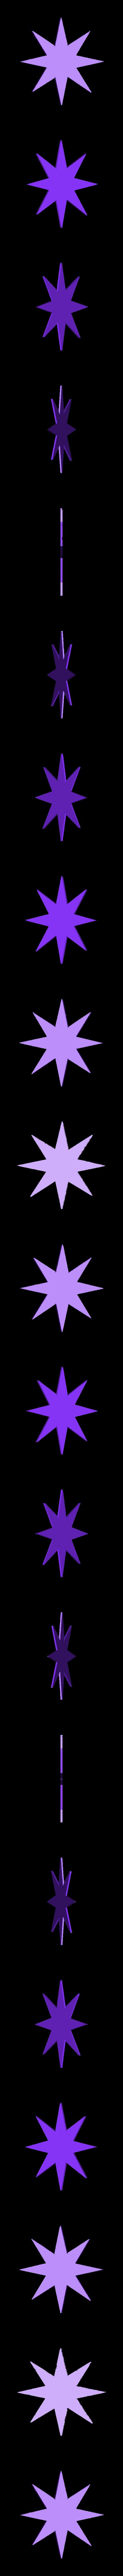 étoile8 5.stl Download STL file the christmas star • 3D printer model, catf3d